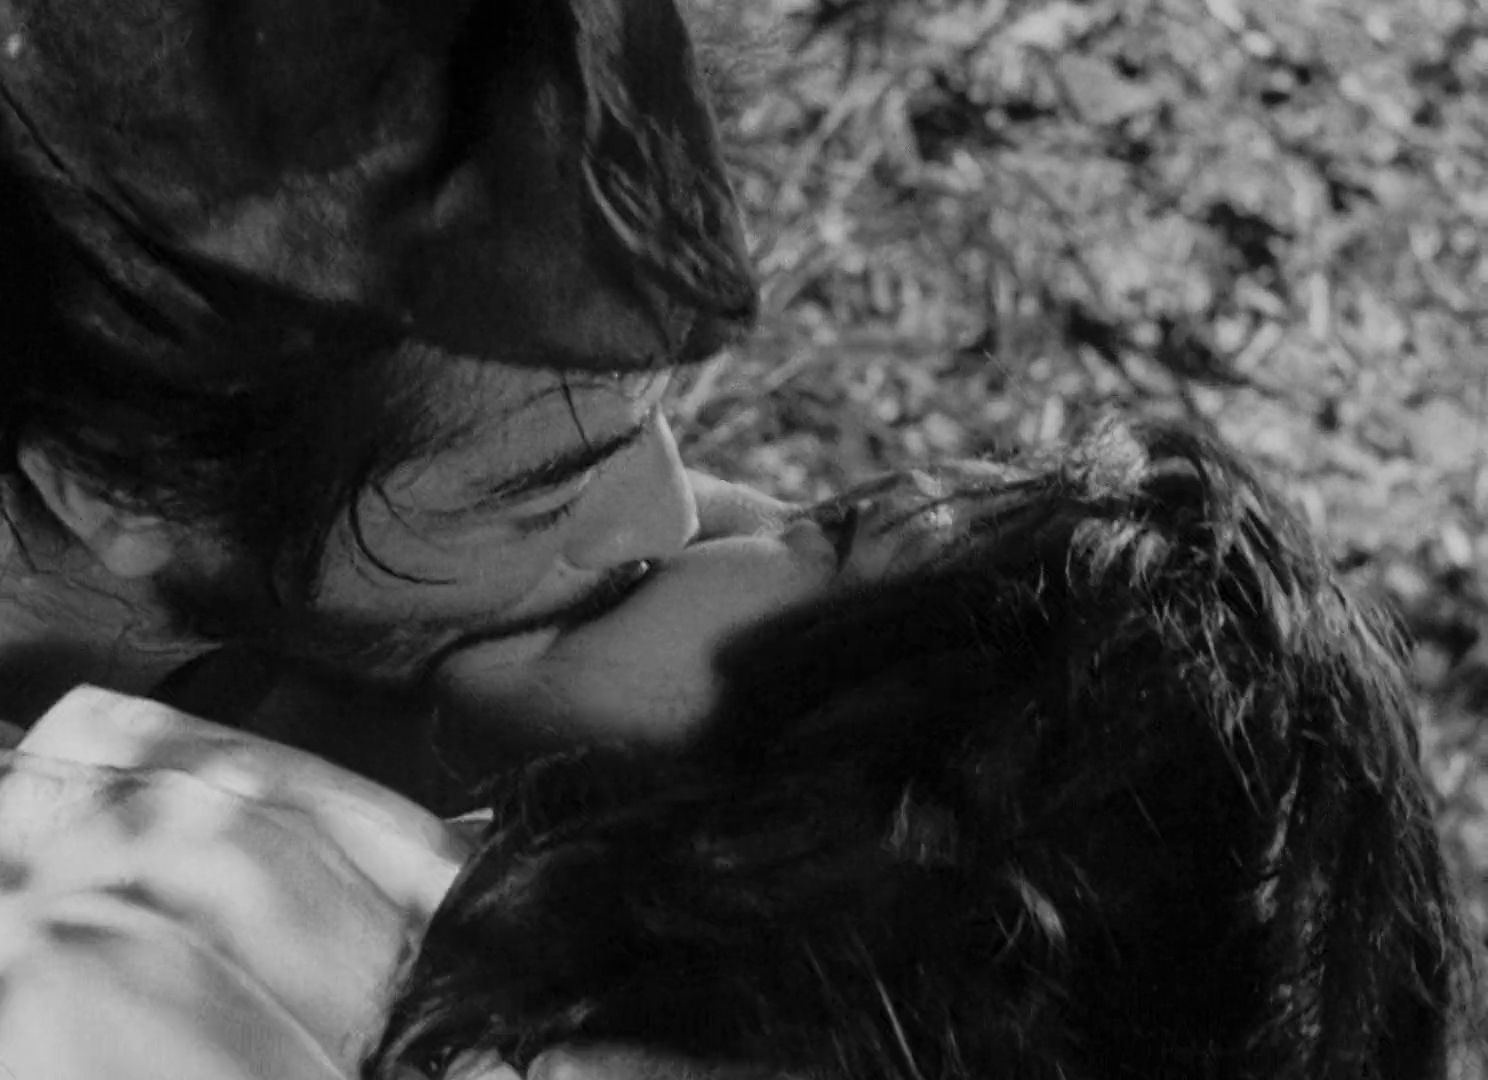 rashomon by akira kurosawa essay When akira kurosawa made rashomon (1950), he was a forty-year-old director   like most of kurosawa's films, rashomon, based on two stories by  in this  essay originally published in the new yorker, roger angell hails.